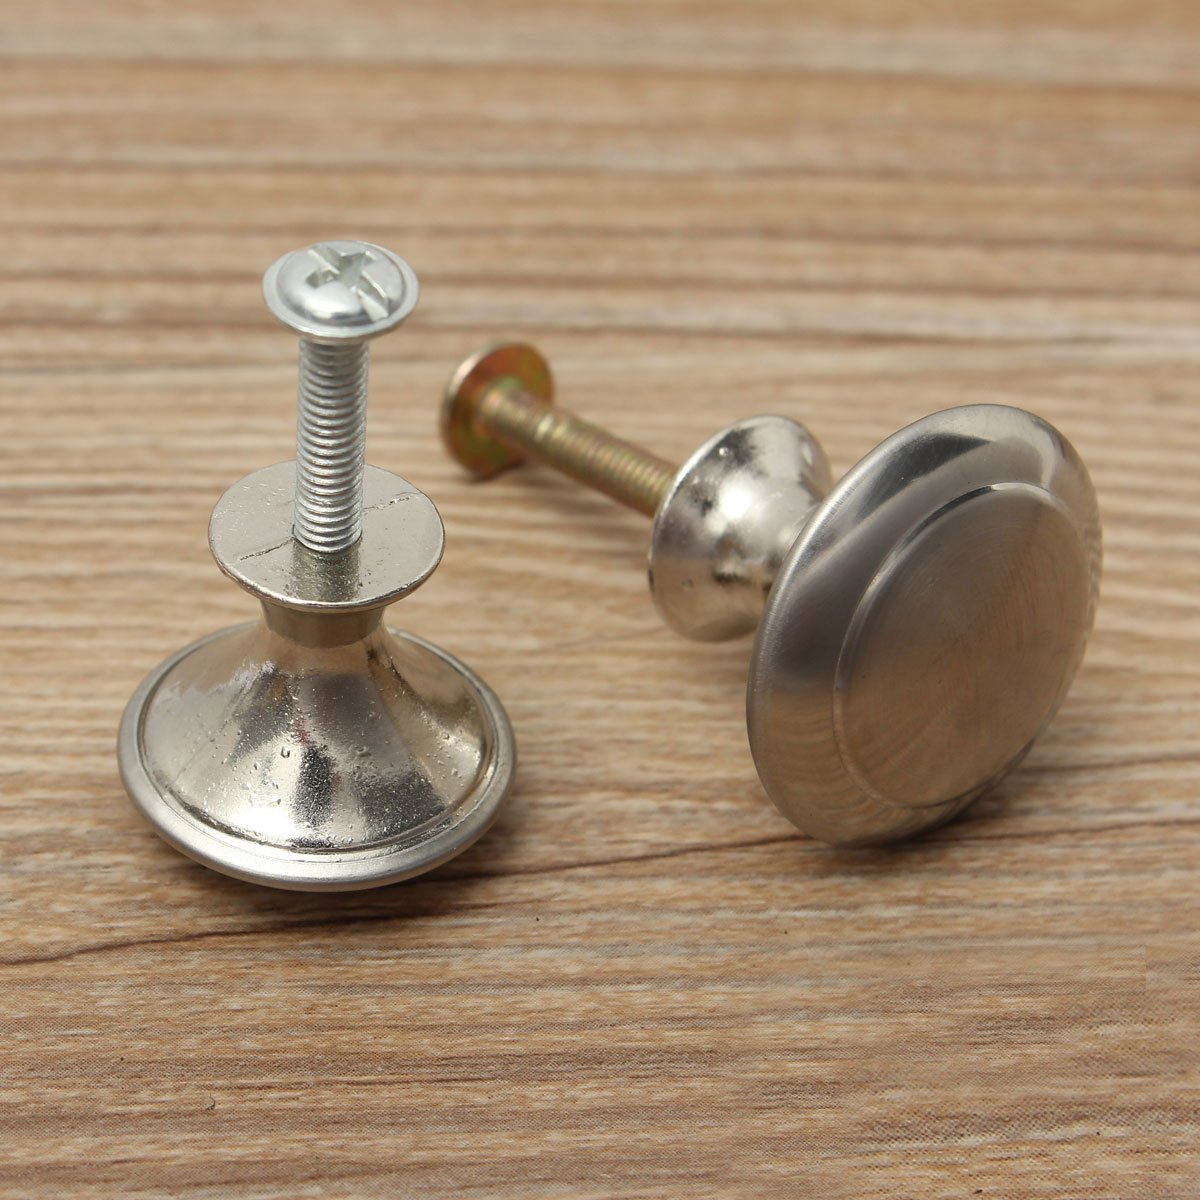 4 Pcs Stainless Steel Satin Nickel Cabinet Round Pull Knobs Hardware W/ Screw 28MM